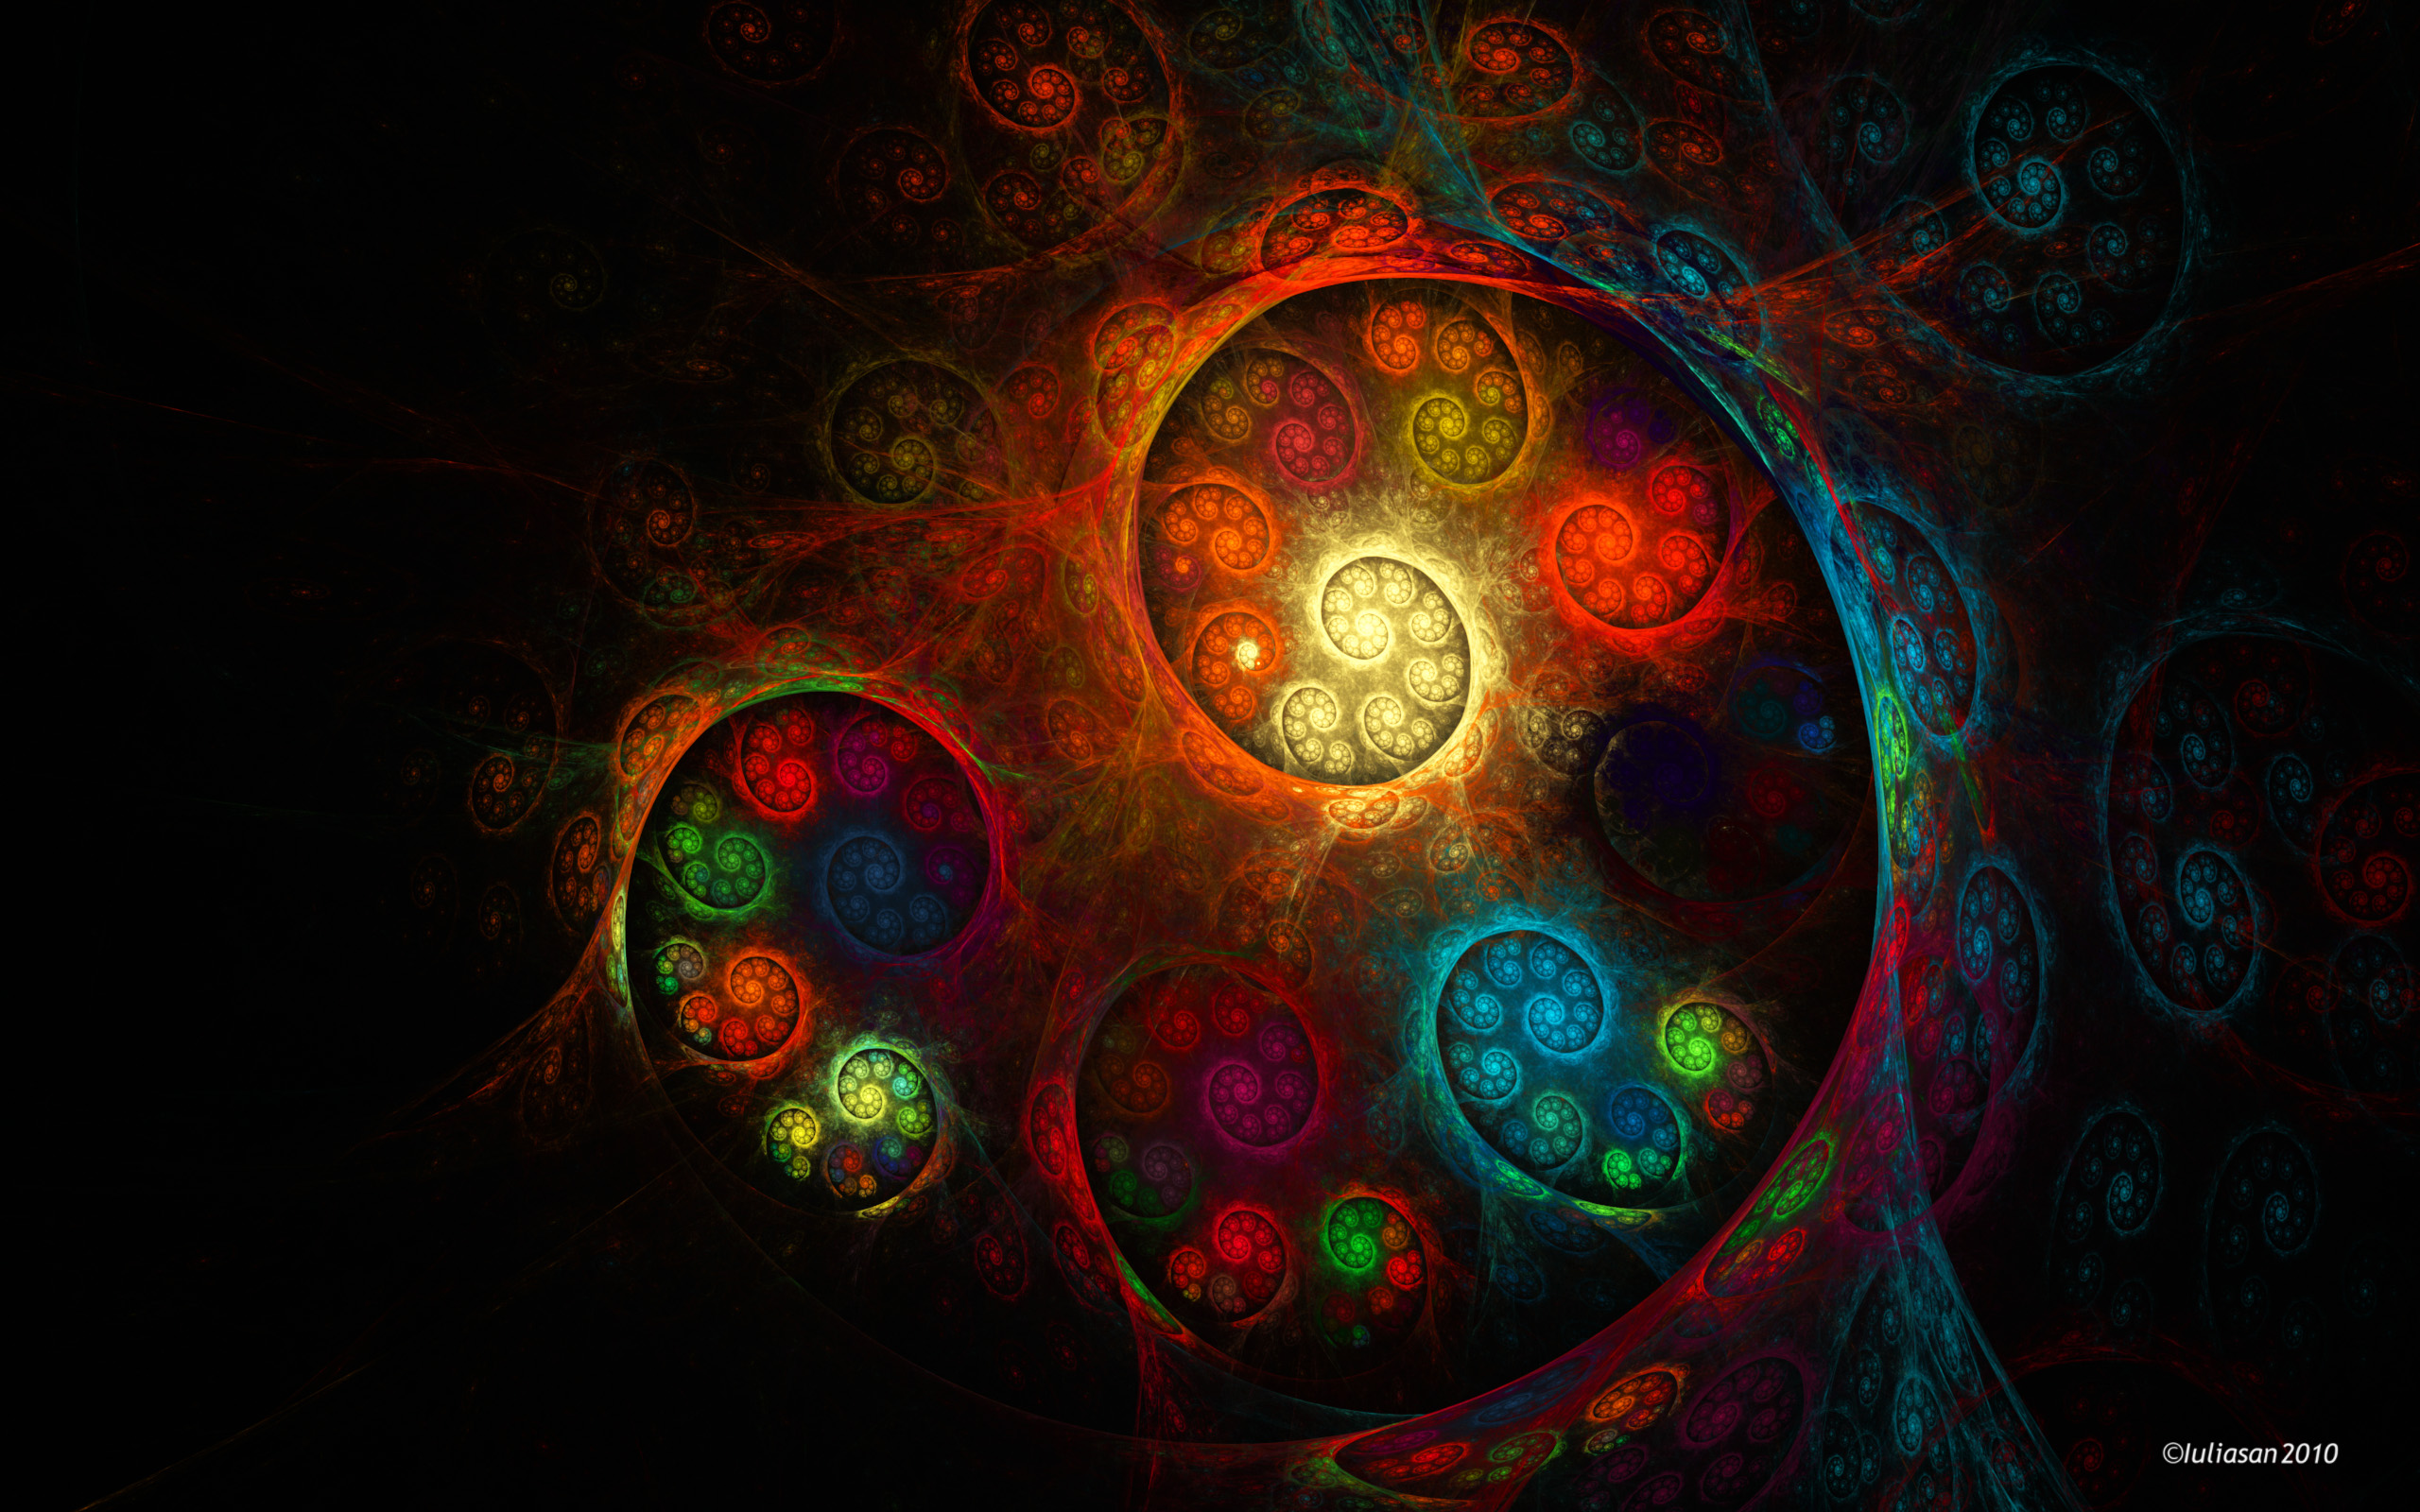 fractal wallpaper background 2560x1600